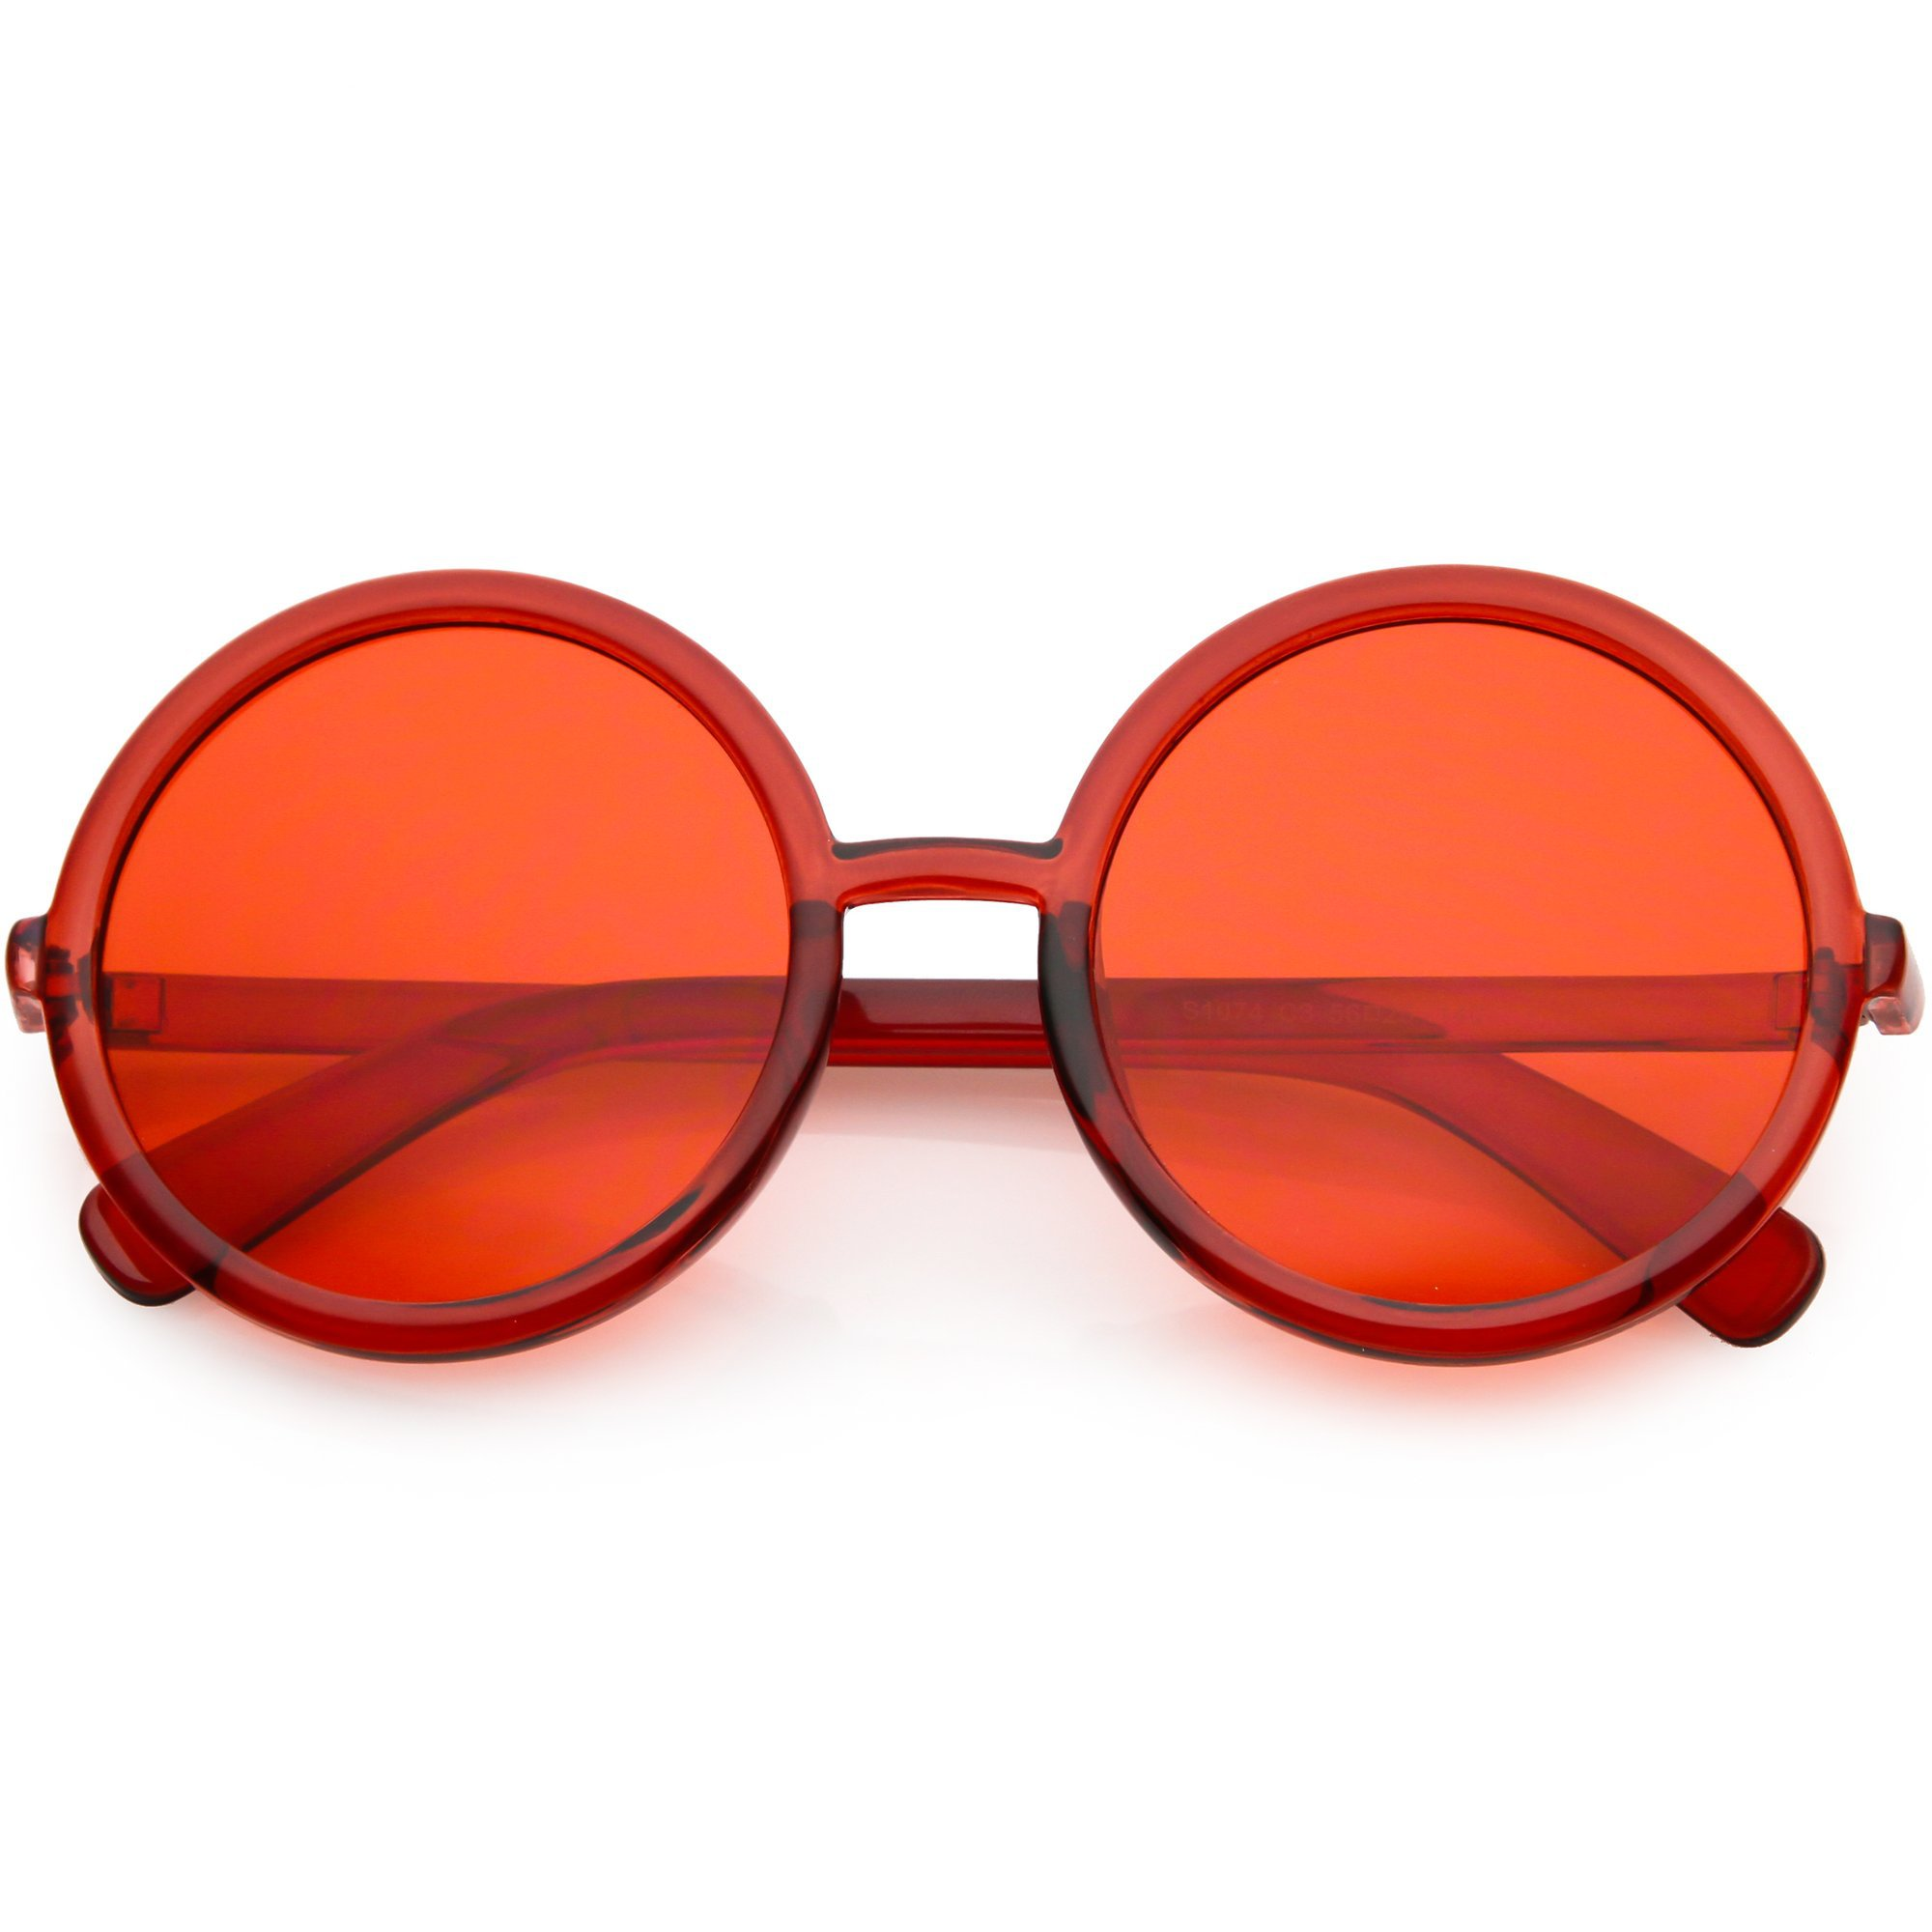 Large Retro Round Circle 1970's Fashion Sunglasses - zeroUV